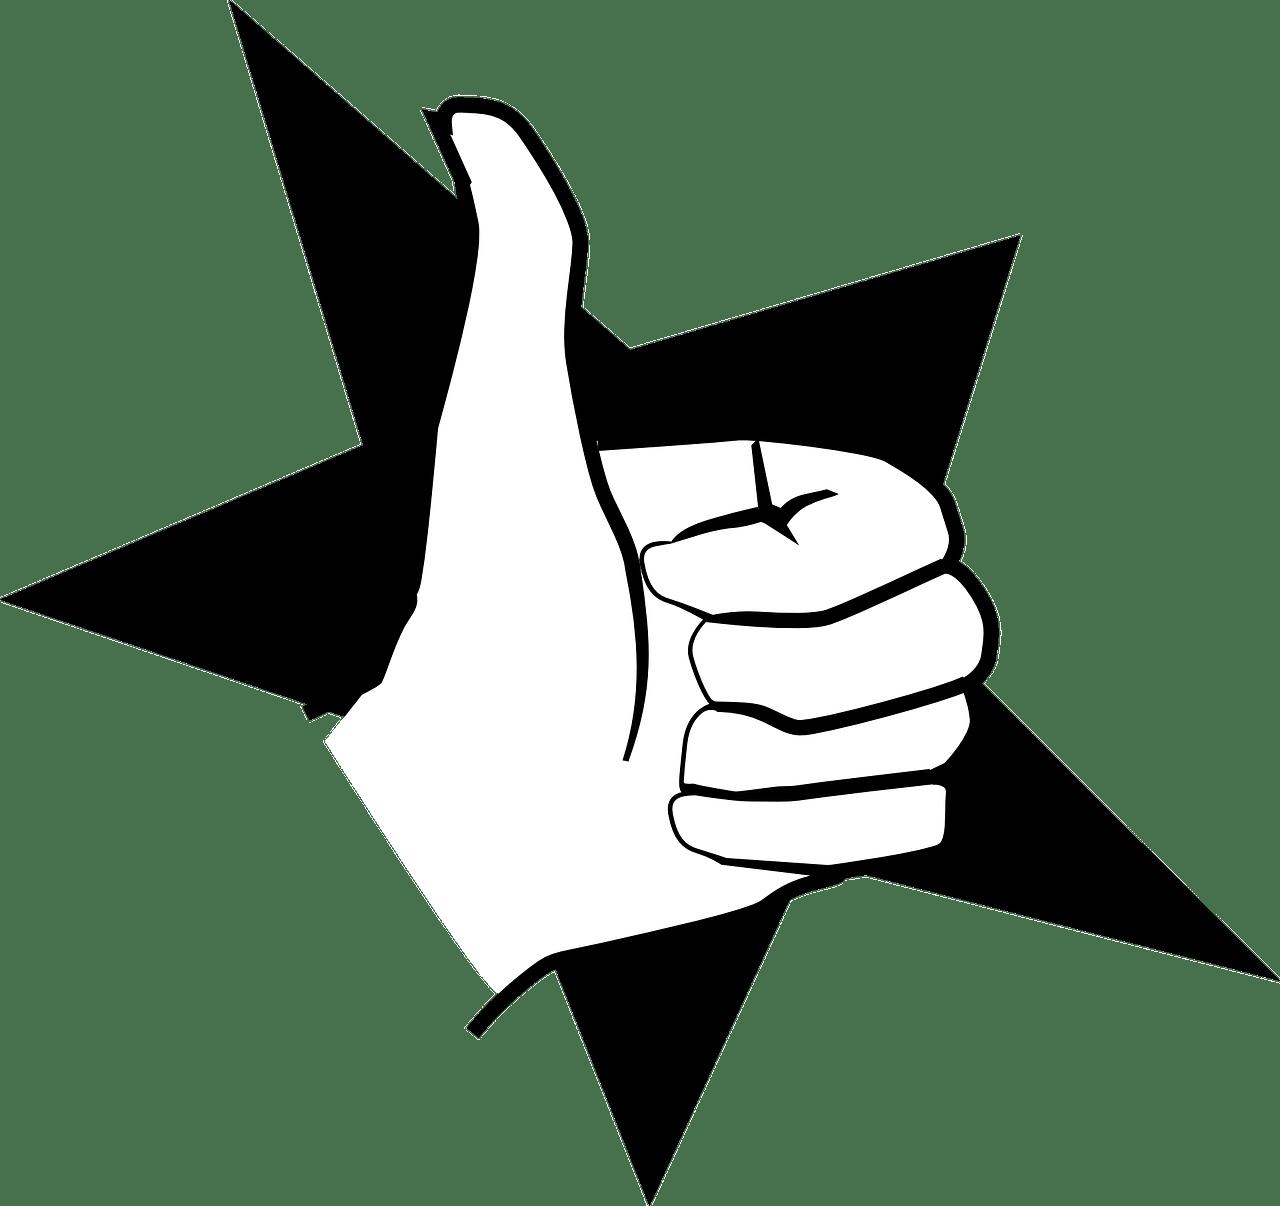 Test clipart finals, Test finals Transparent FREE for